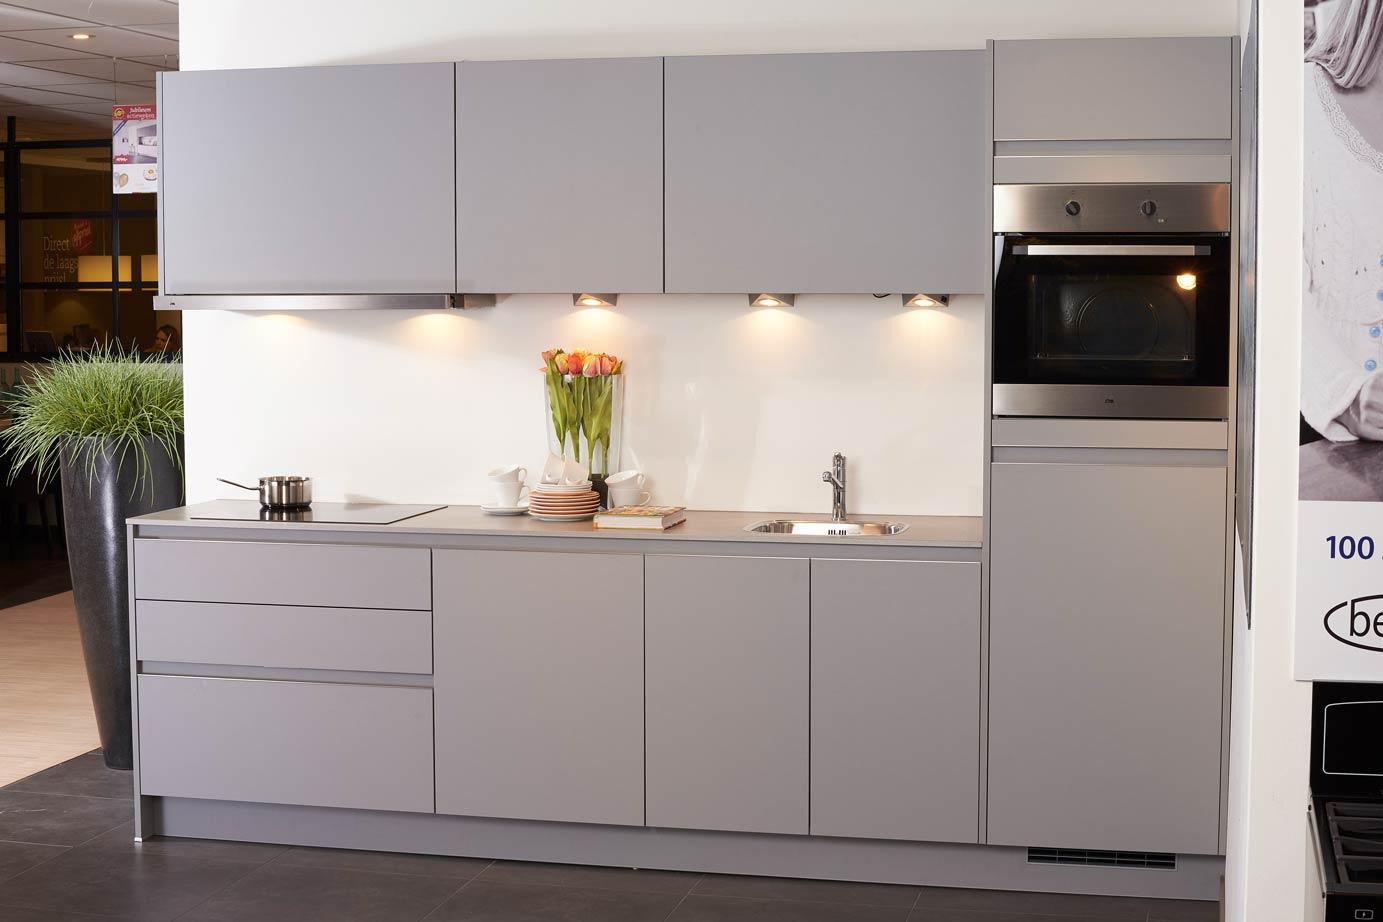 Greeploze Keuken Maken : Greeploze keuken kopen? Strak en modern design DB Keukens